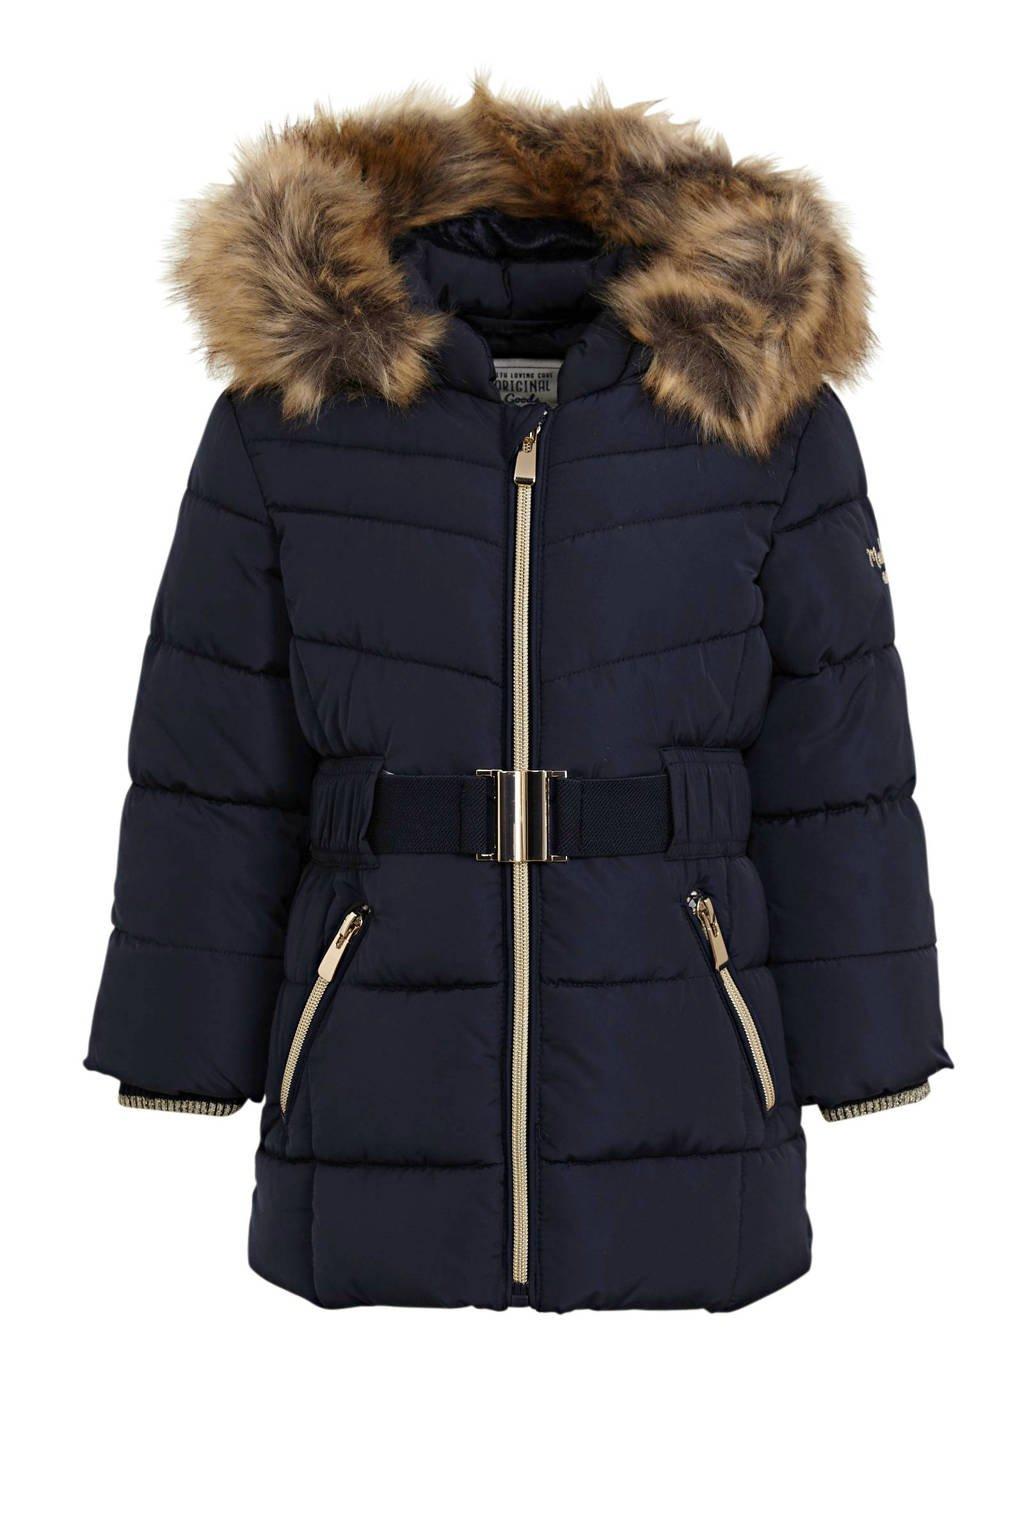 C&A Palomino gewatteerde winterjas donkerblauw, Donkerblauw